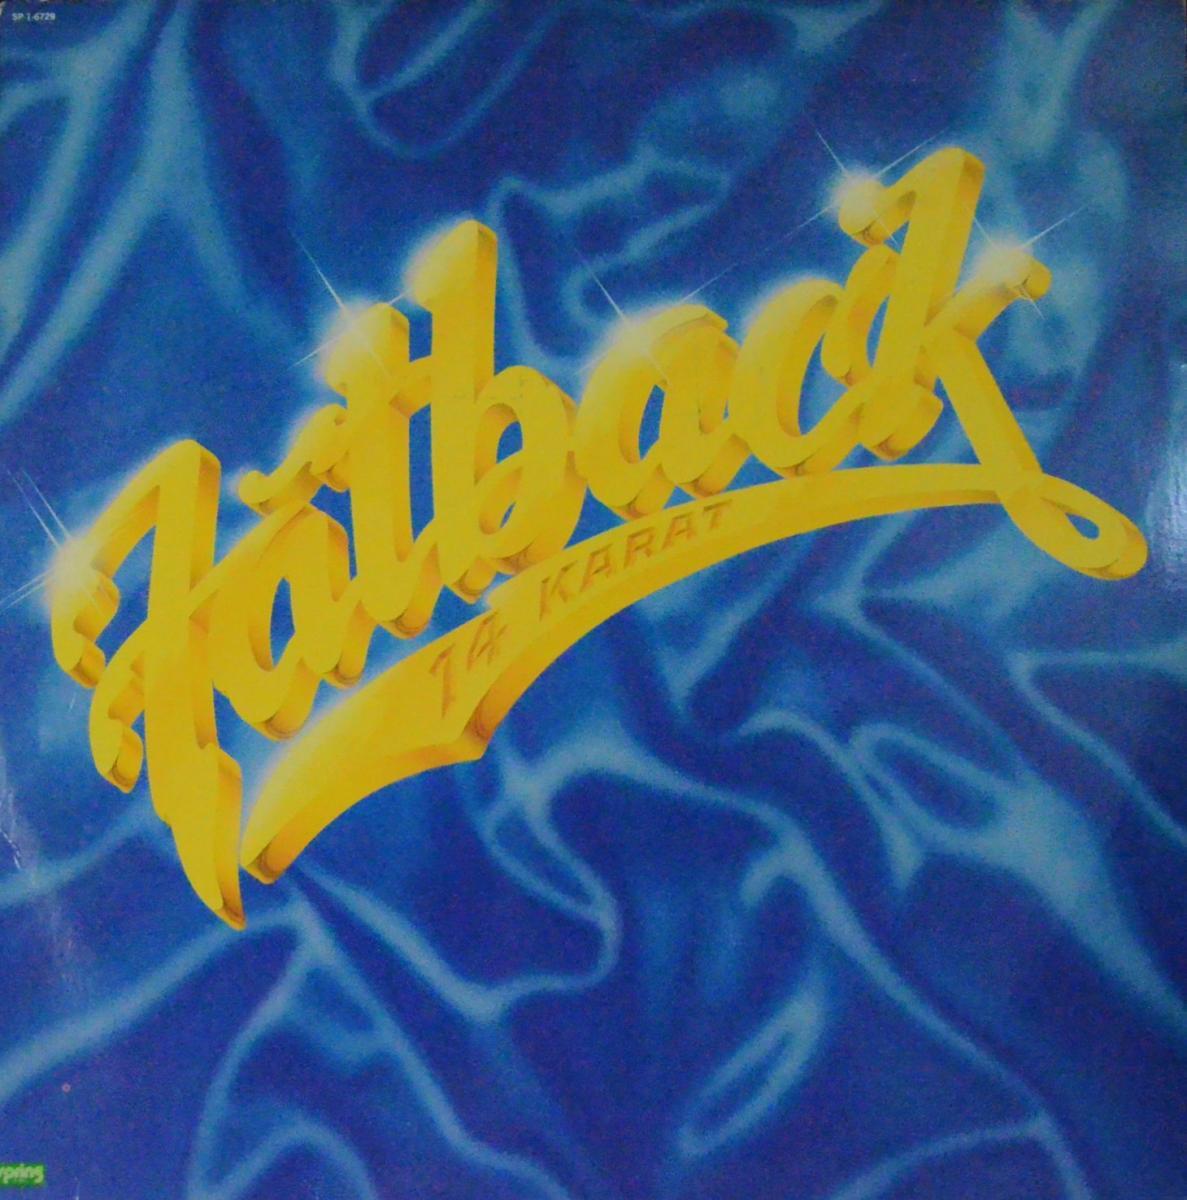 FATBACK / 14 KARAT (LP)